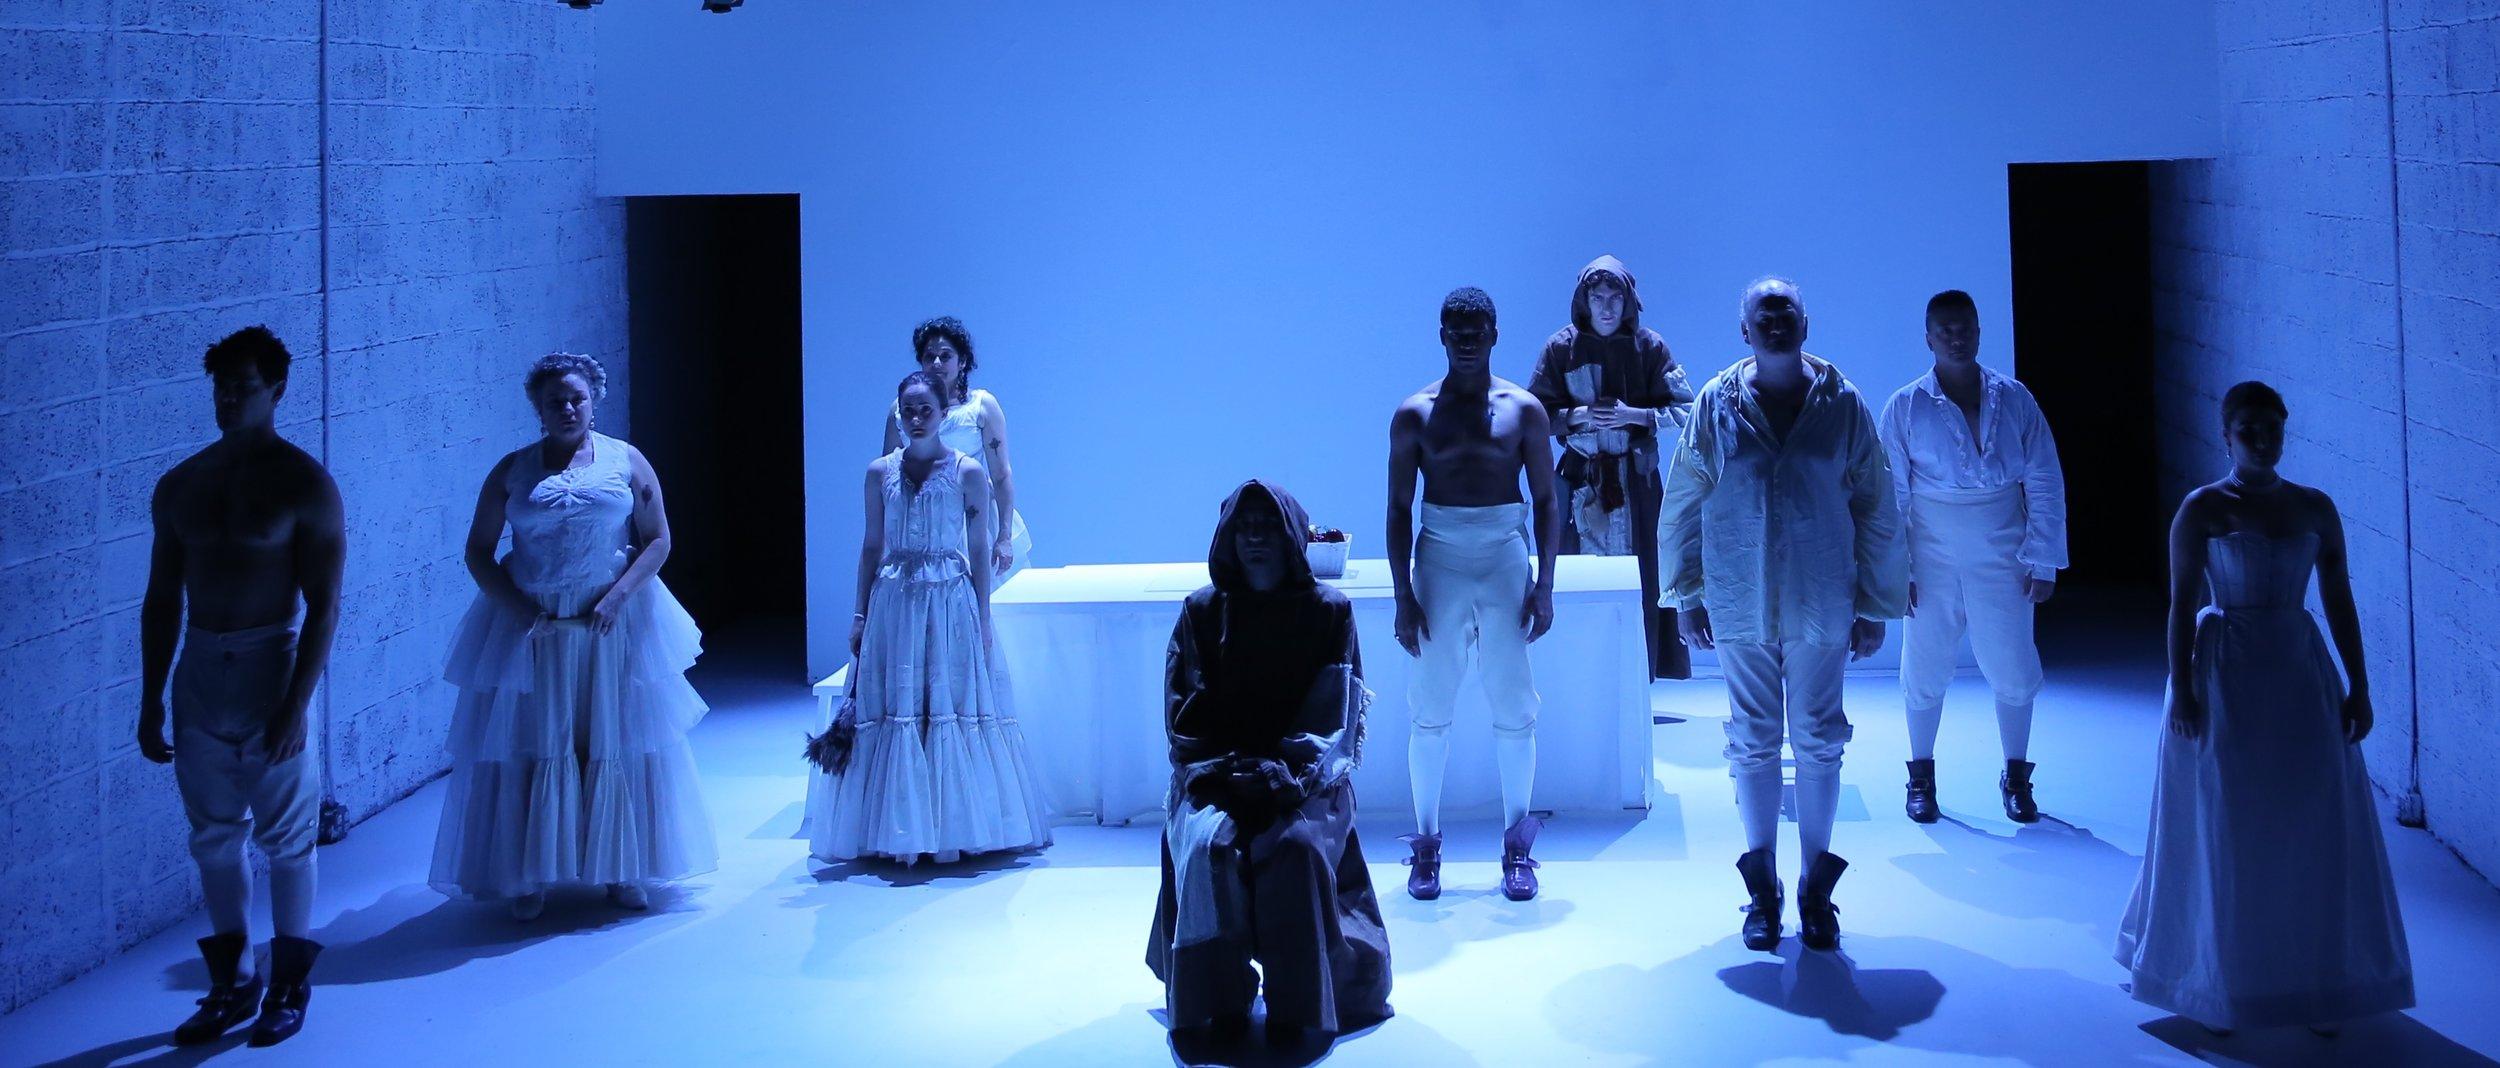 Tartuffe, Phoenix Theatre Ensemble, director Craig Smith, Costume Design Debbi HObson, Lighting Design Tsubasa Kamei, Projection Design Attilio Rigotti , Photography Gerry Goodstein